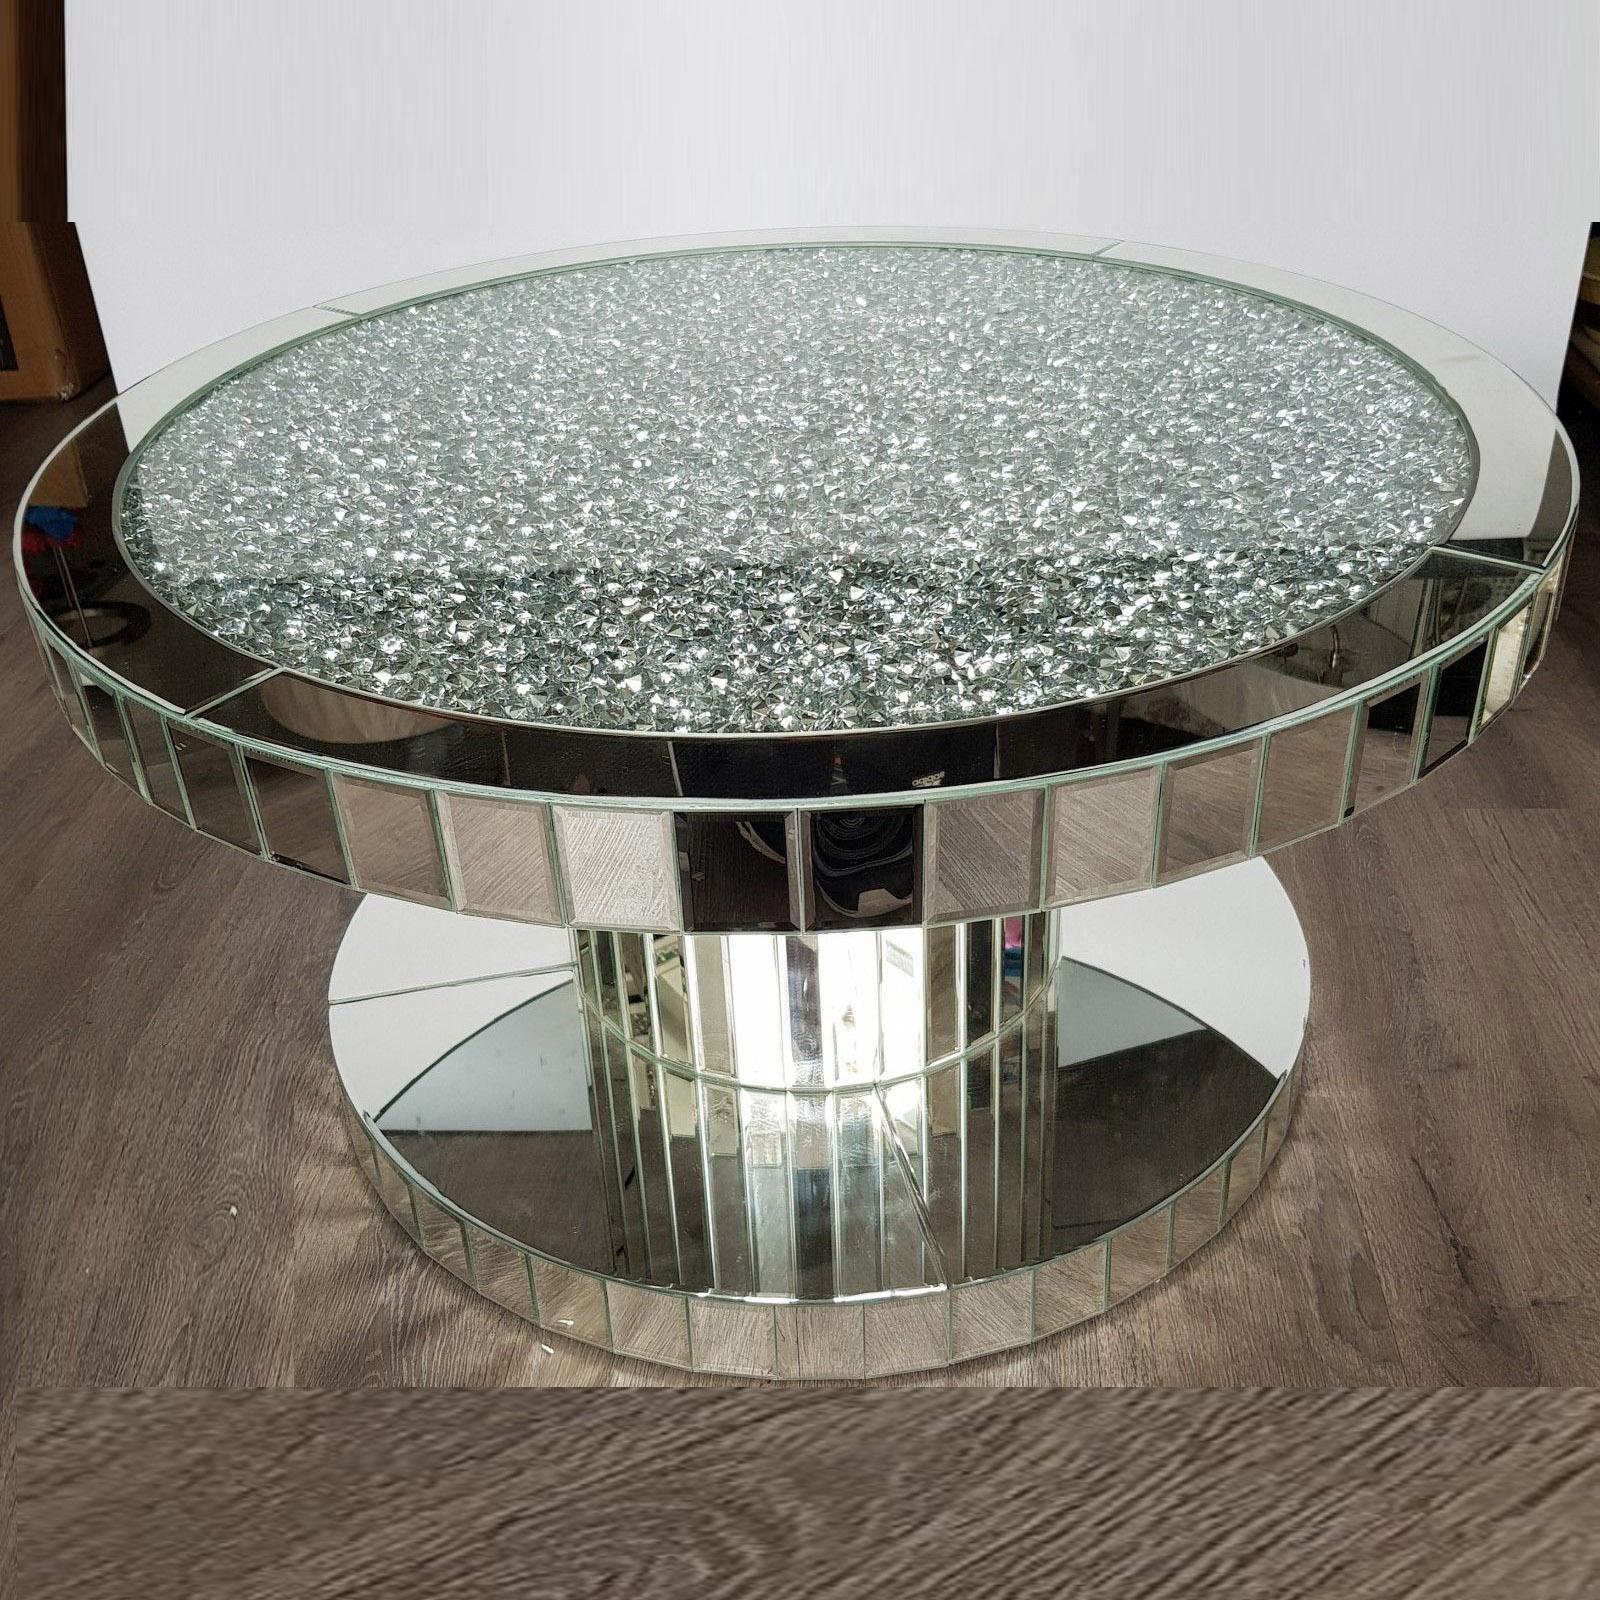 - Crush Diamond Modern Wood Round Mirrored Dining Coffee Table - Buy